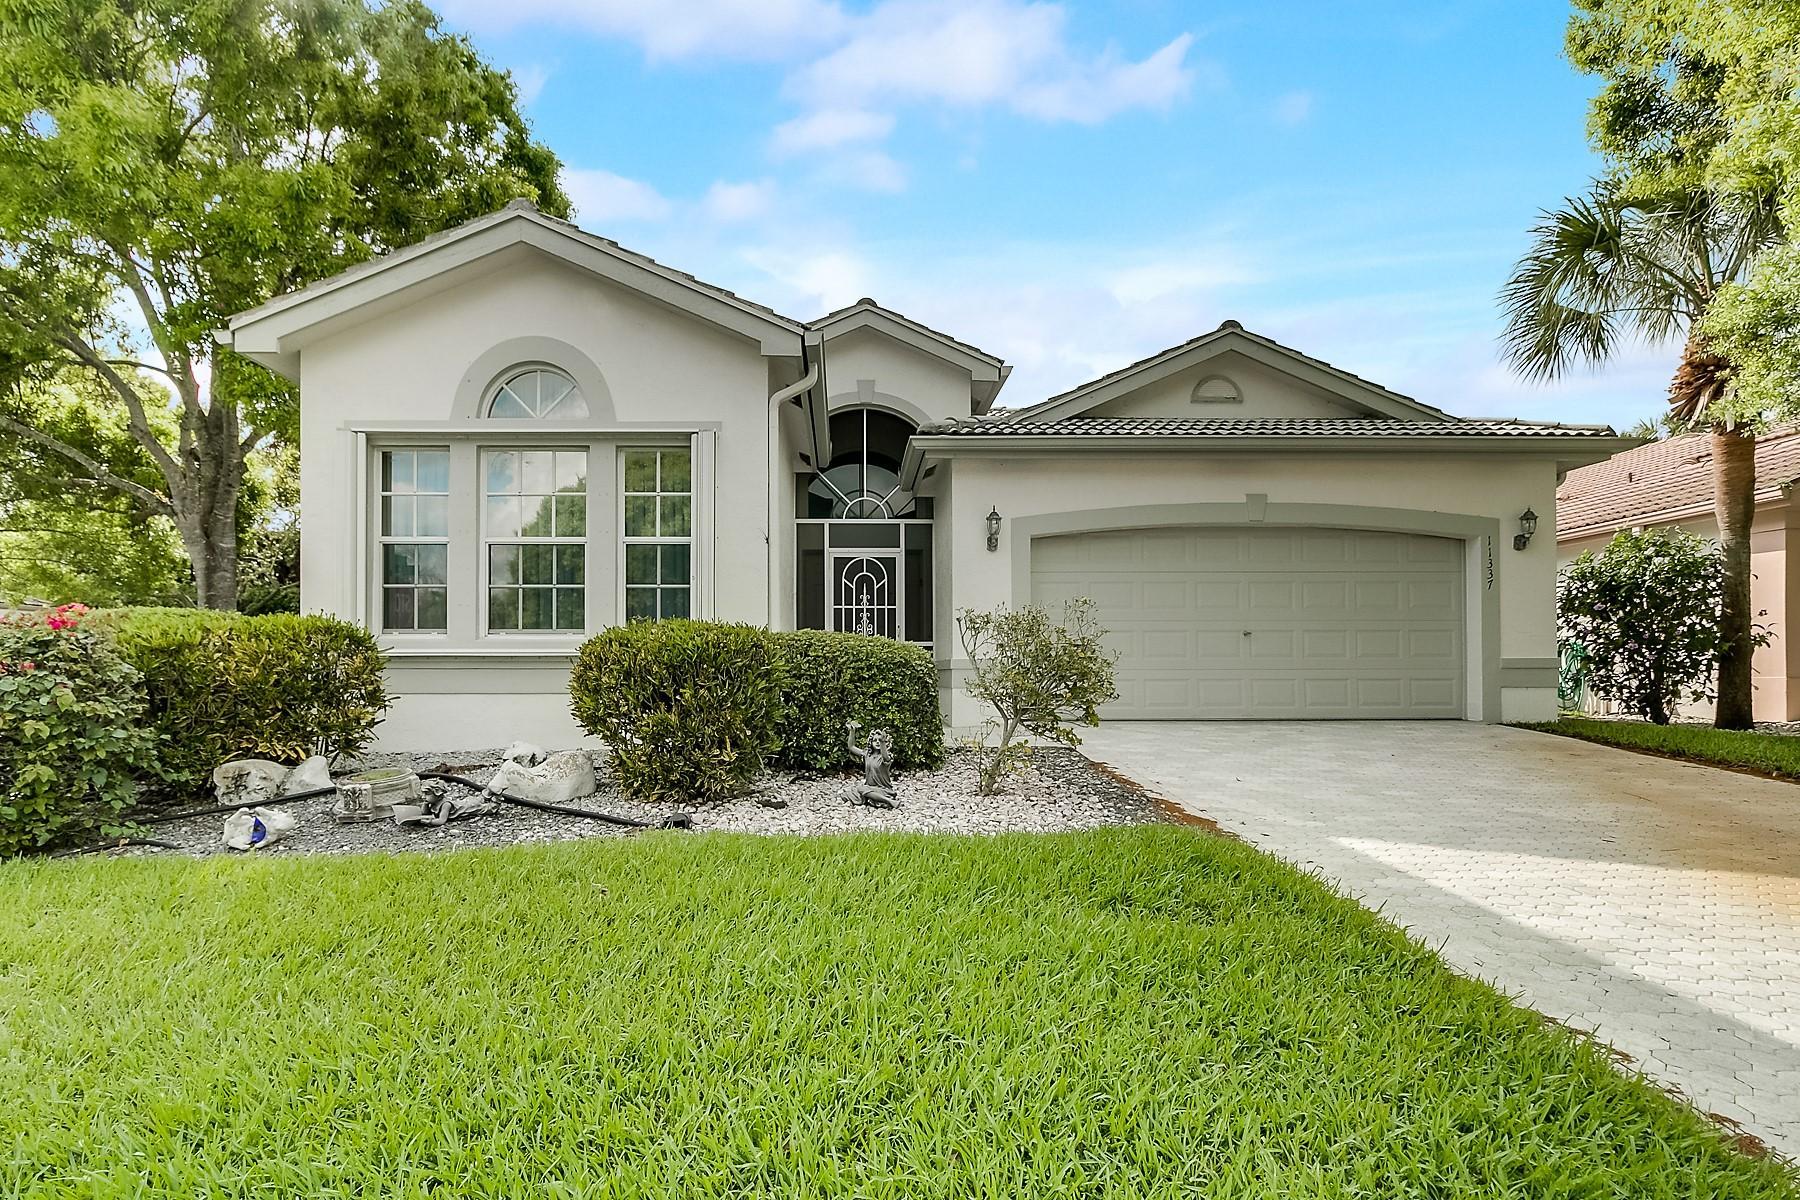 11337 Ola Avenue Boynton Beach, FL 33437